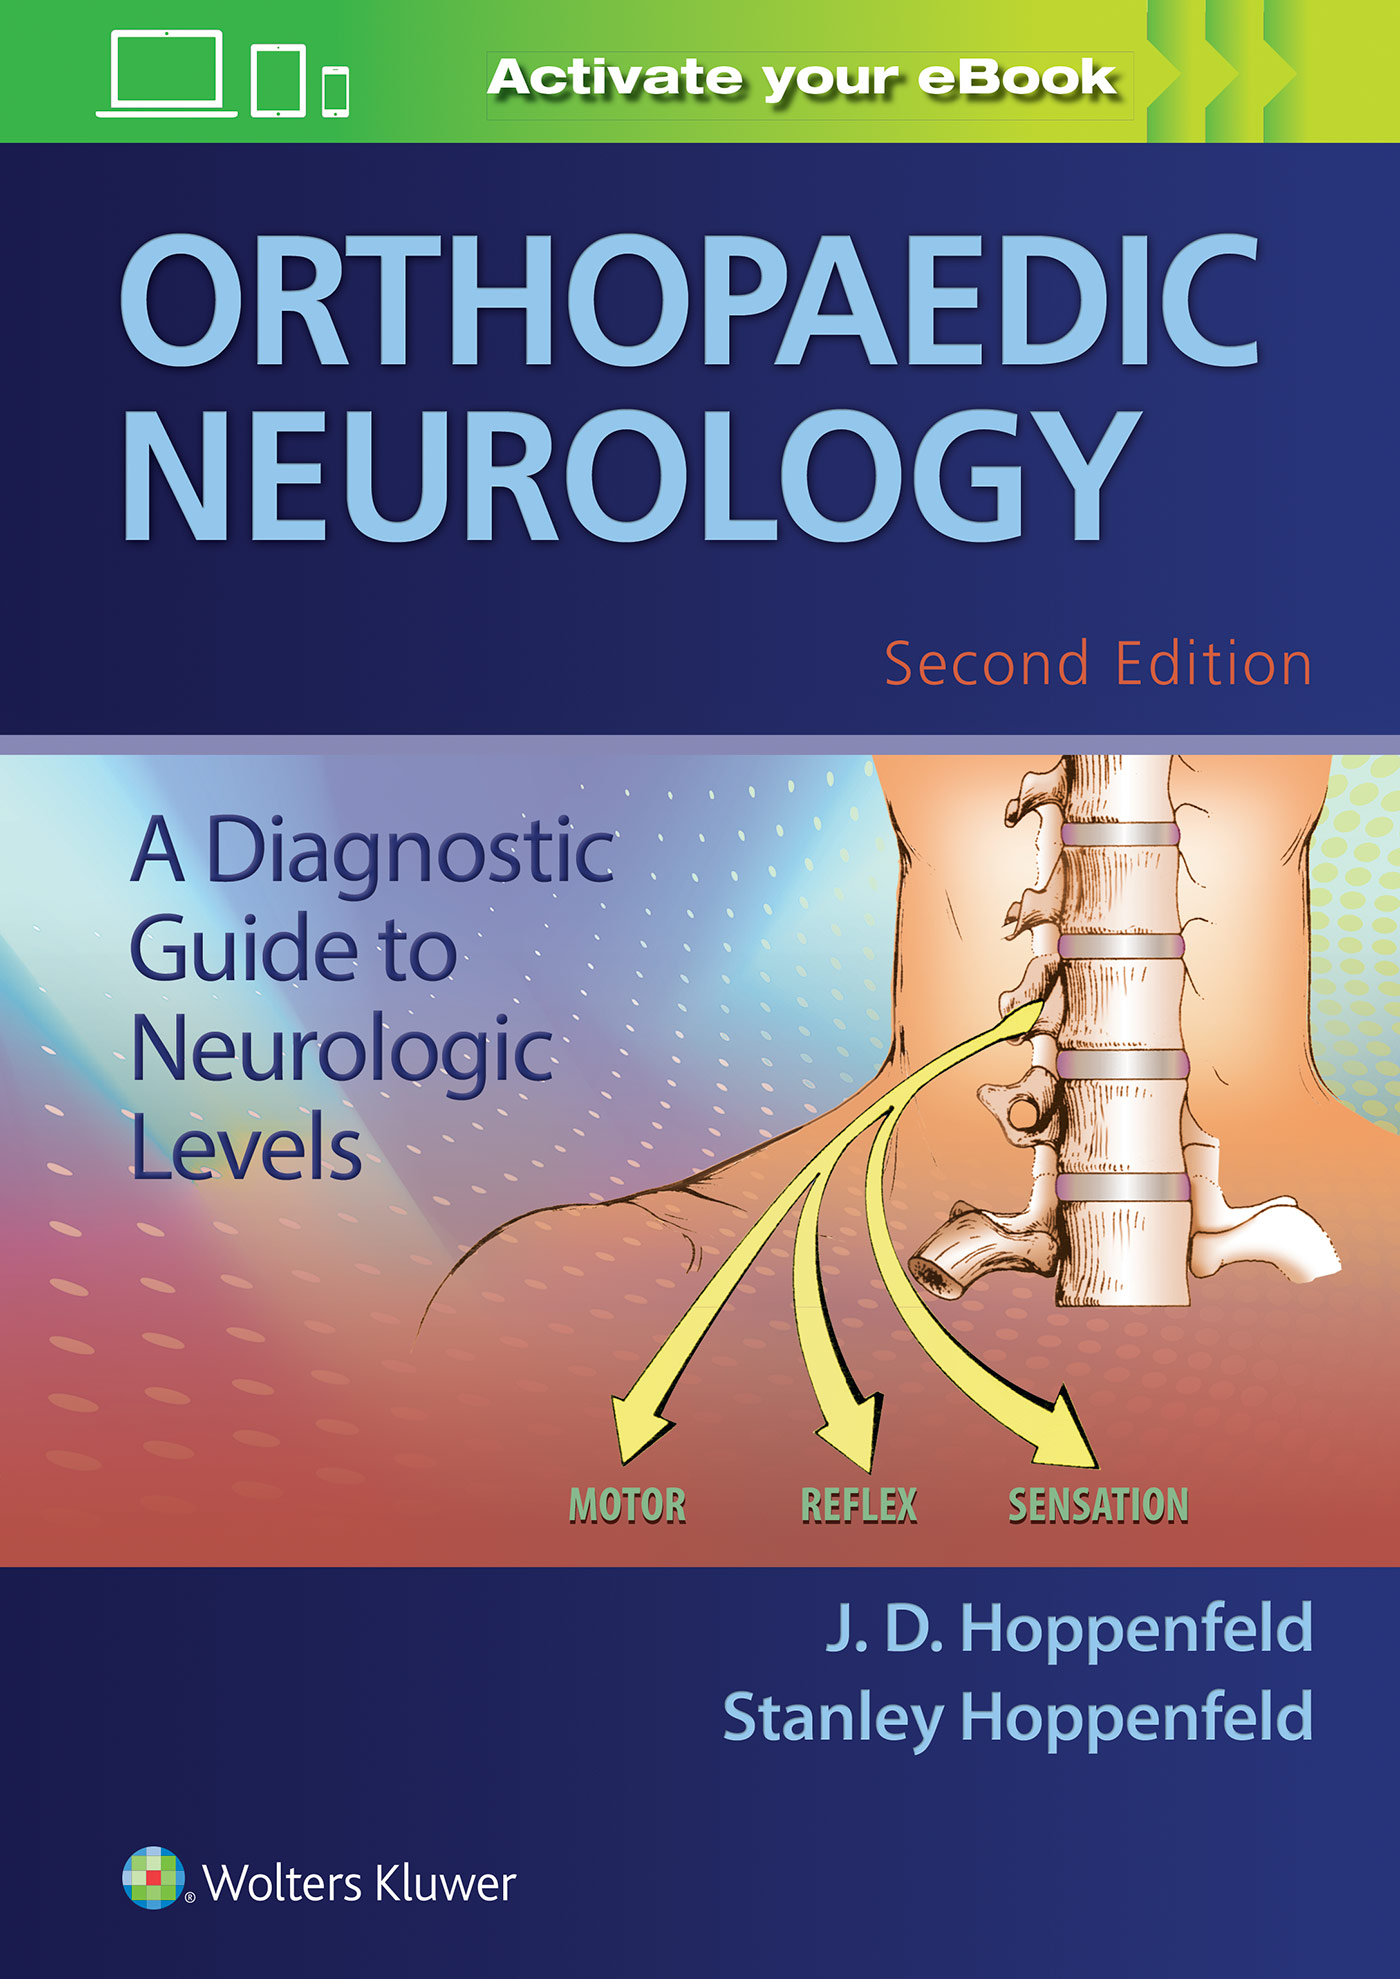 Orthopaedic Neurology                                           A Diagnostic Guide to Neurologic Levels